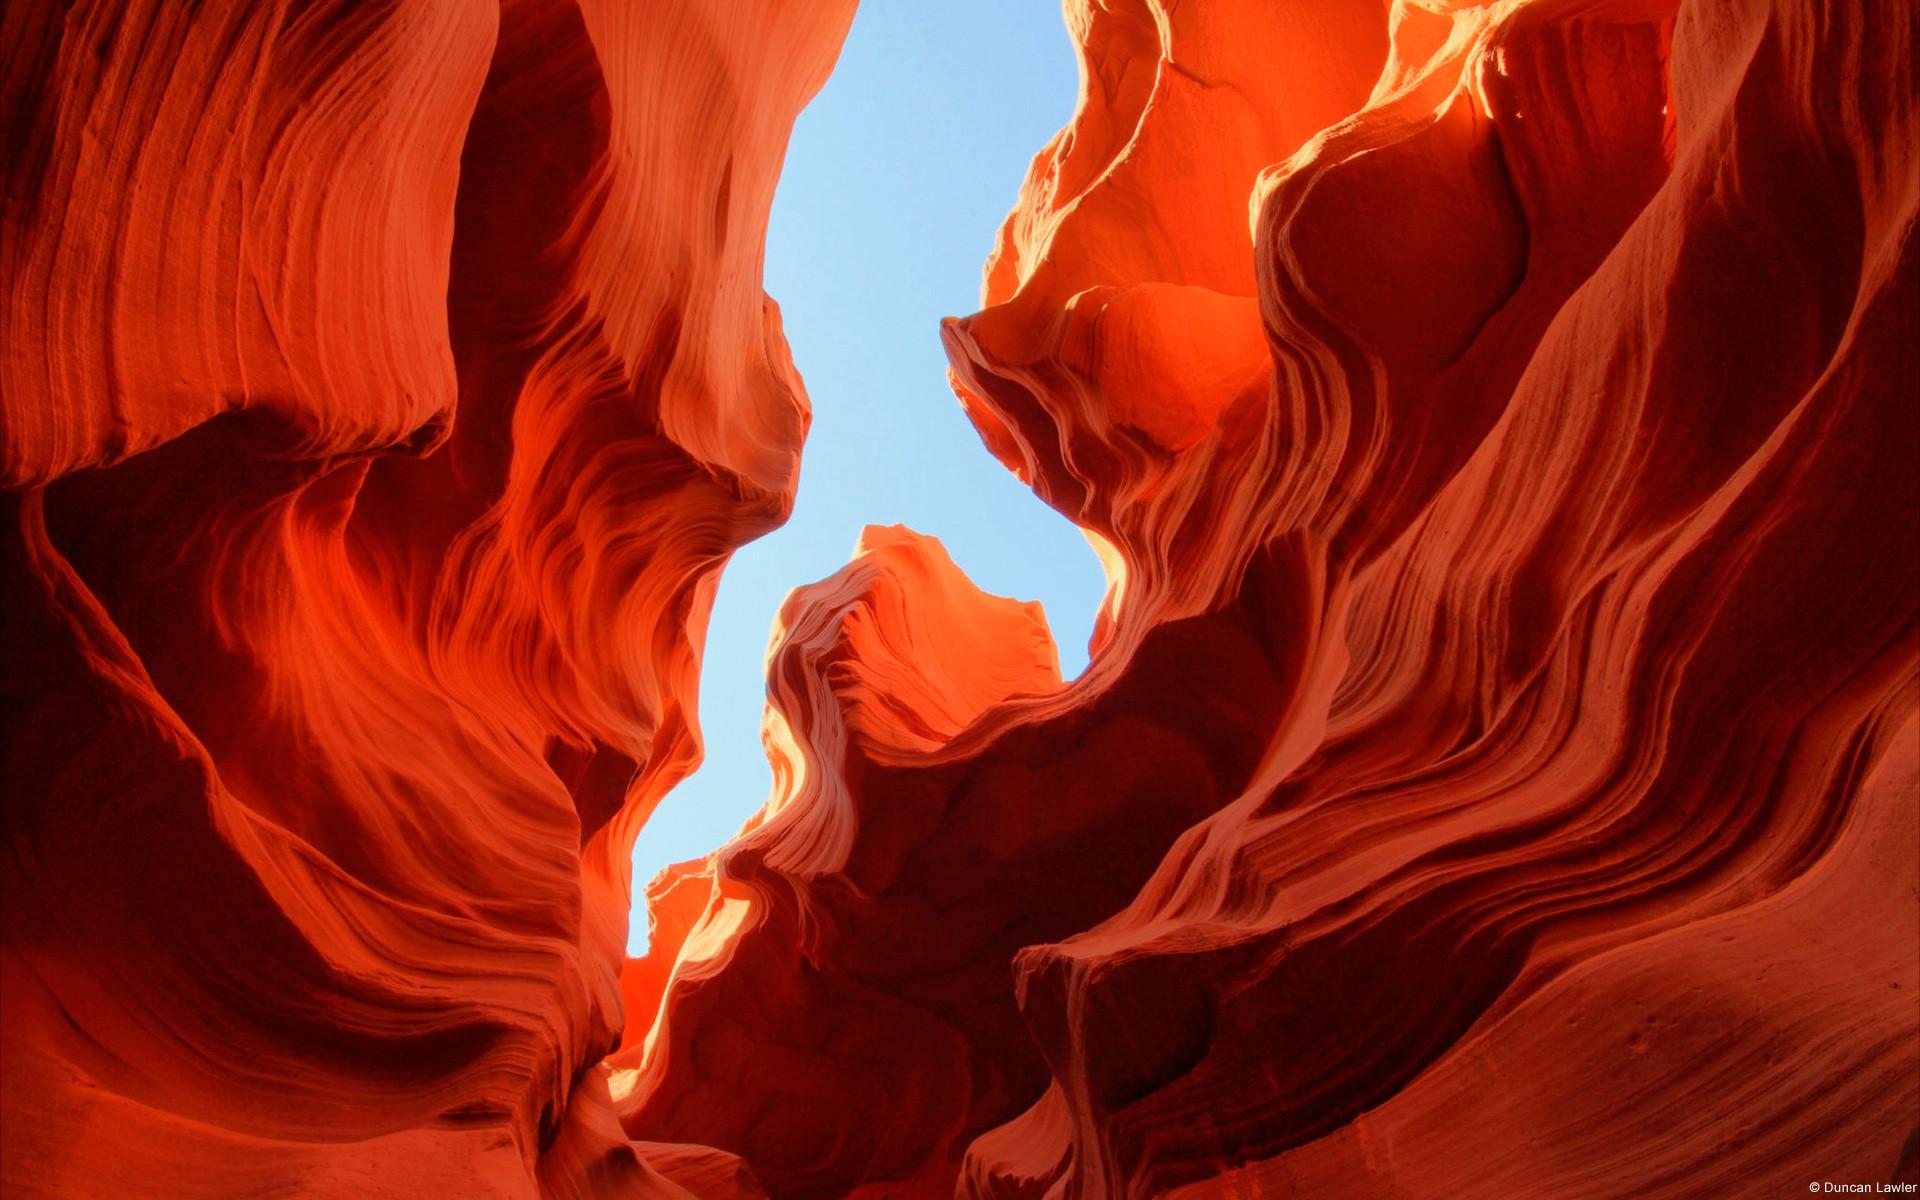 General 1920x1200 nature landscape rock formation canyon Antelope Canyon Arizona red USA rock